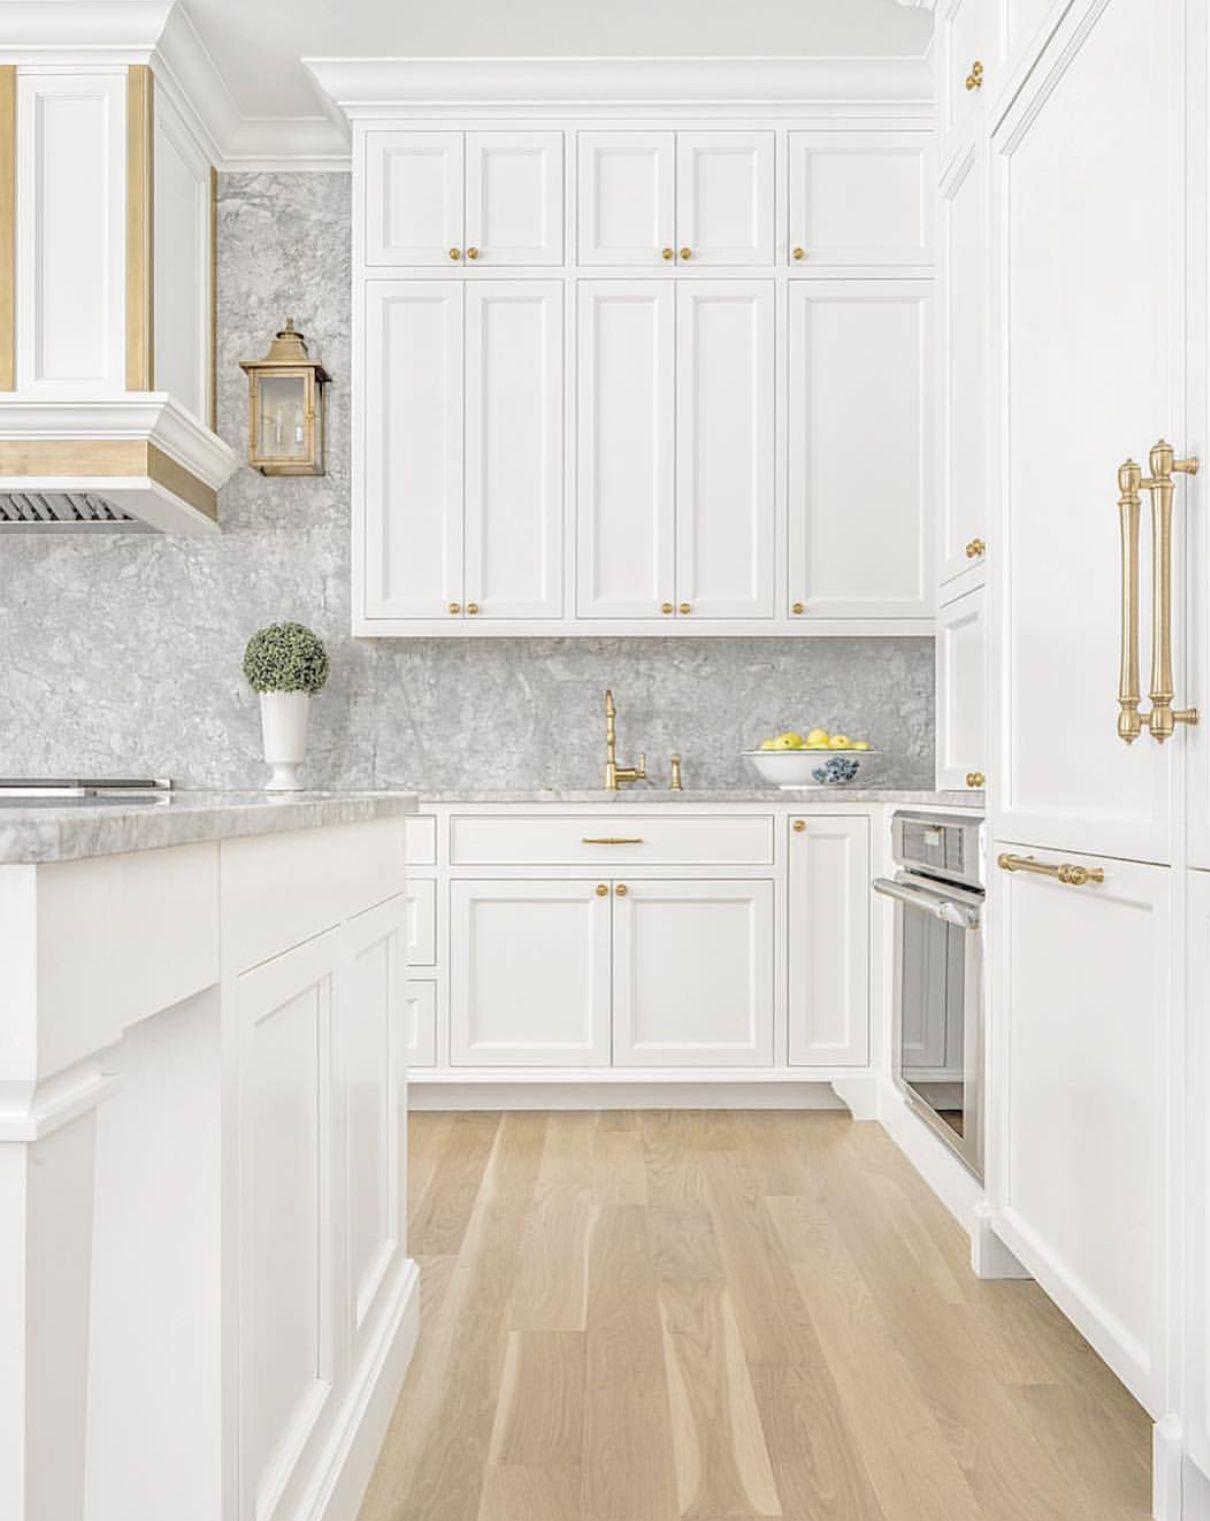 Kitchen Design Ideas White Kitchens Kitchen Inspiration Dining Table Accessories White Kitchen Design Modern Kitchen Design Modern Kitchen Interiors